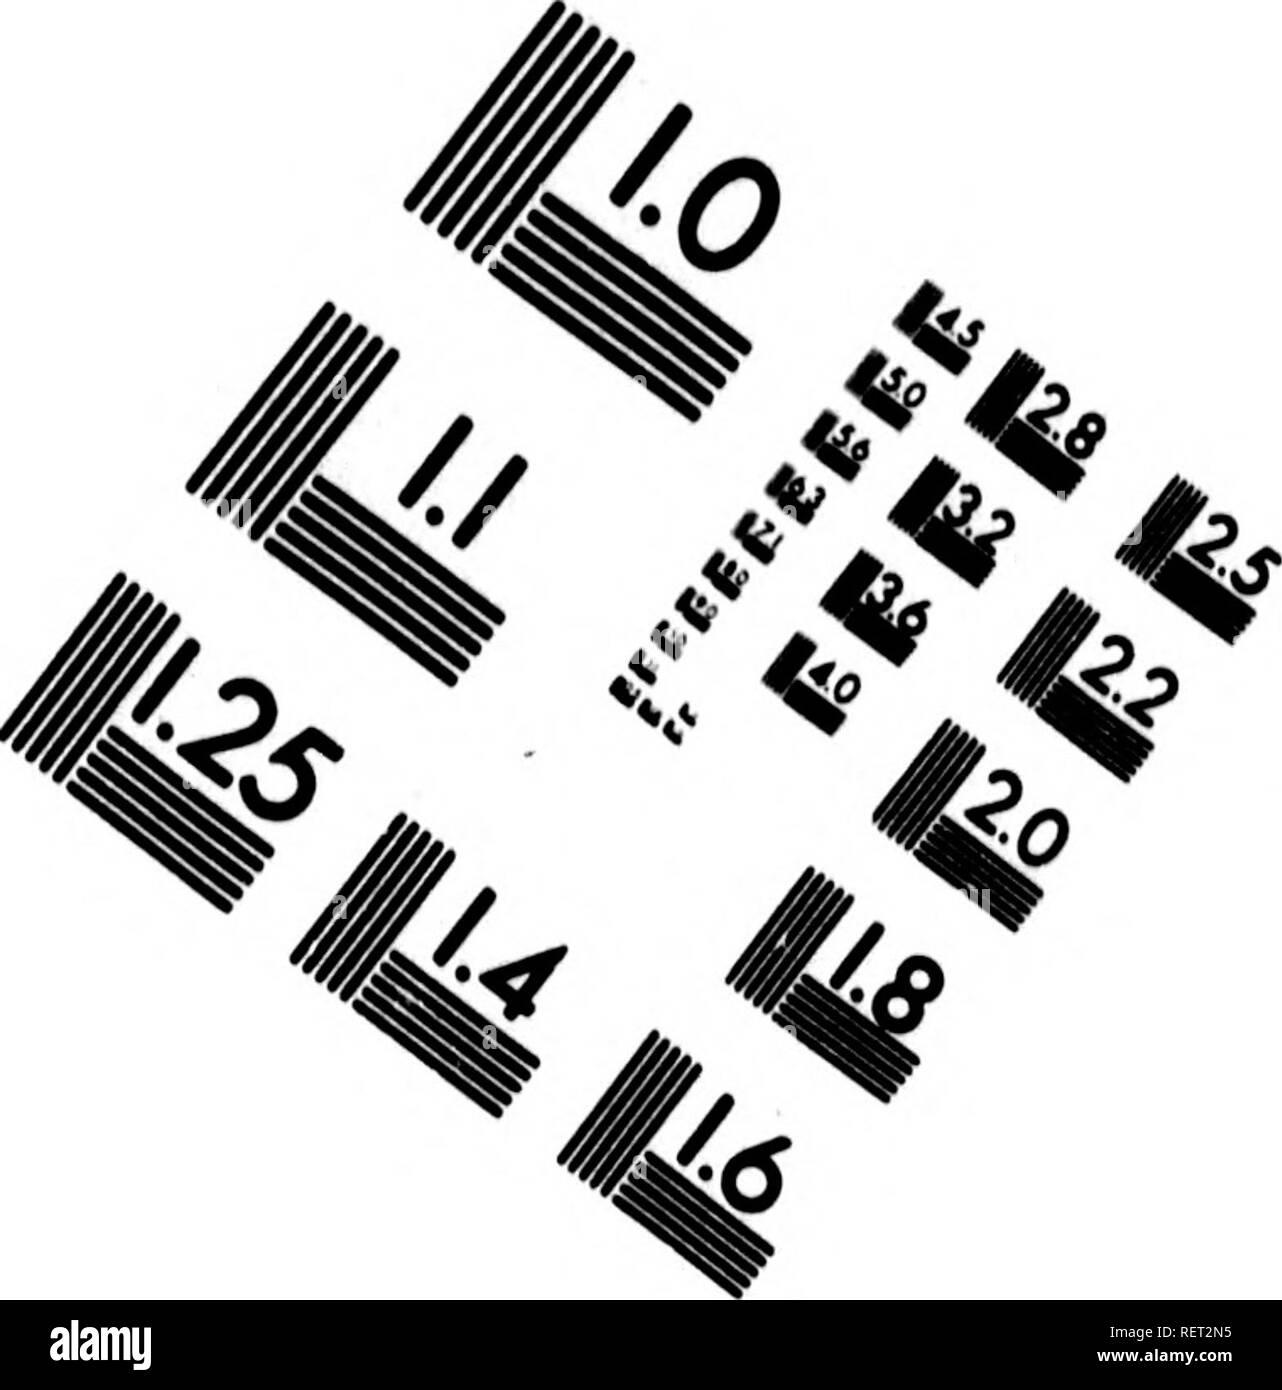 ". Histoire naturelle, générale et particulière [microforme] : [s] ervant de suite à l'histoire naturelle de l'homme. Sciences naturelles; Natural history. IMAGE EVALUATION TEST TARGET (MT-3). 1.0 l.l â A^llâ |2.5 1^ Ui 12.2 140 1.25 II 1.4 II 1 é. 4 6"" ⺠%'J^. Please note that these images are extracted from scanned page images that may have been digitally enhanced for readability - coloration and appearance of these illustrations may not perfectly resemble the original work.. Buffon, Georges Louis Leclerc, comte de, 1707-1788. A Paris : De l'Imprimerie royale - Stock Image"